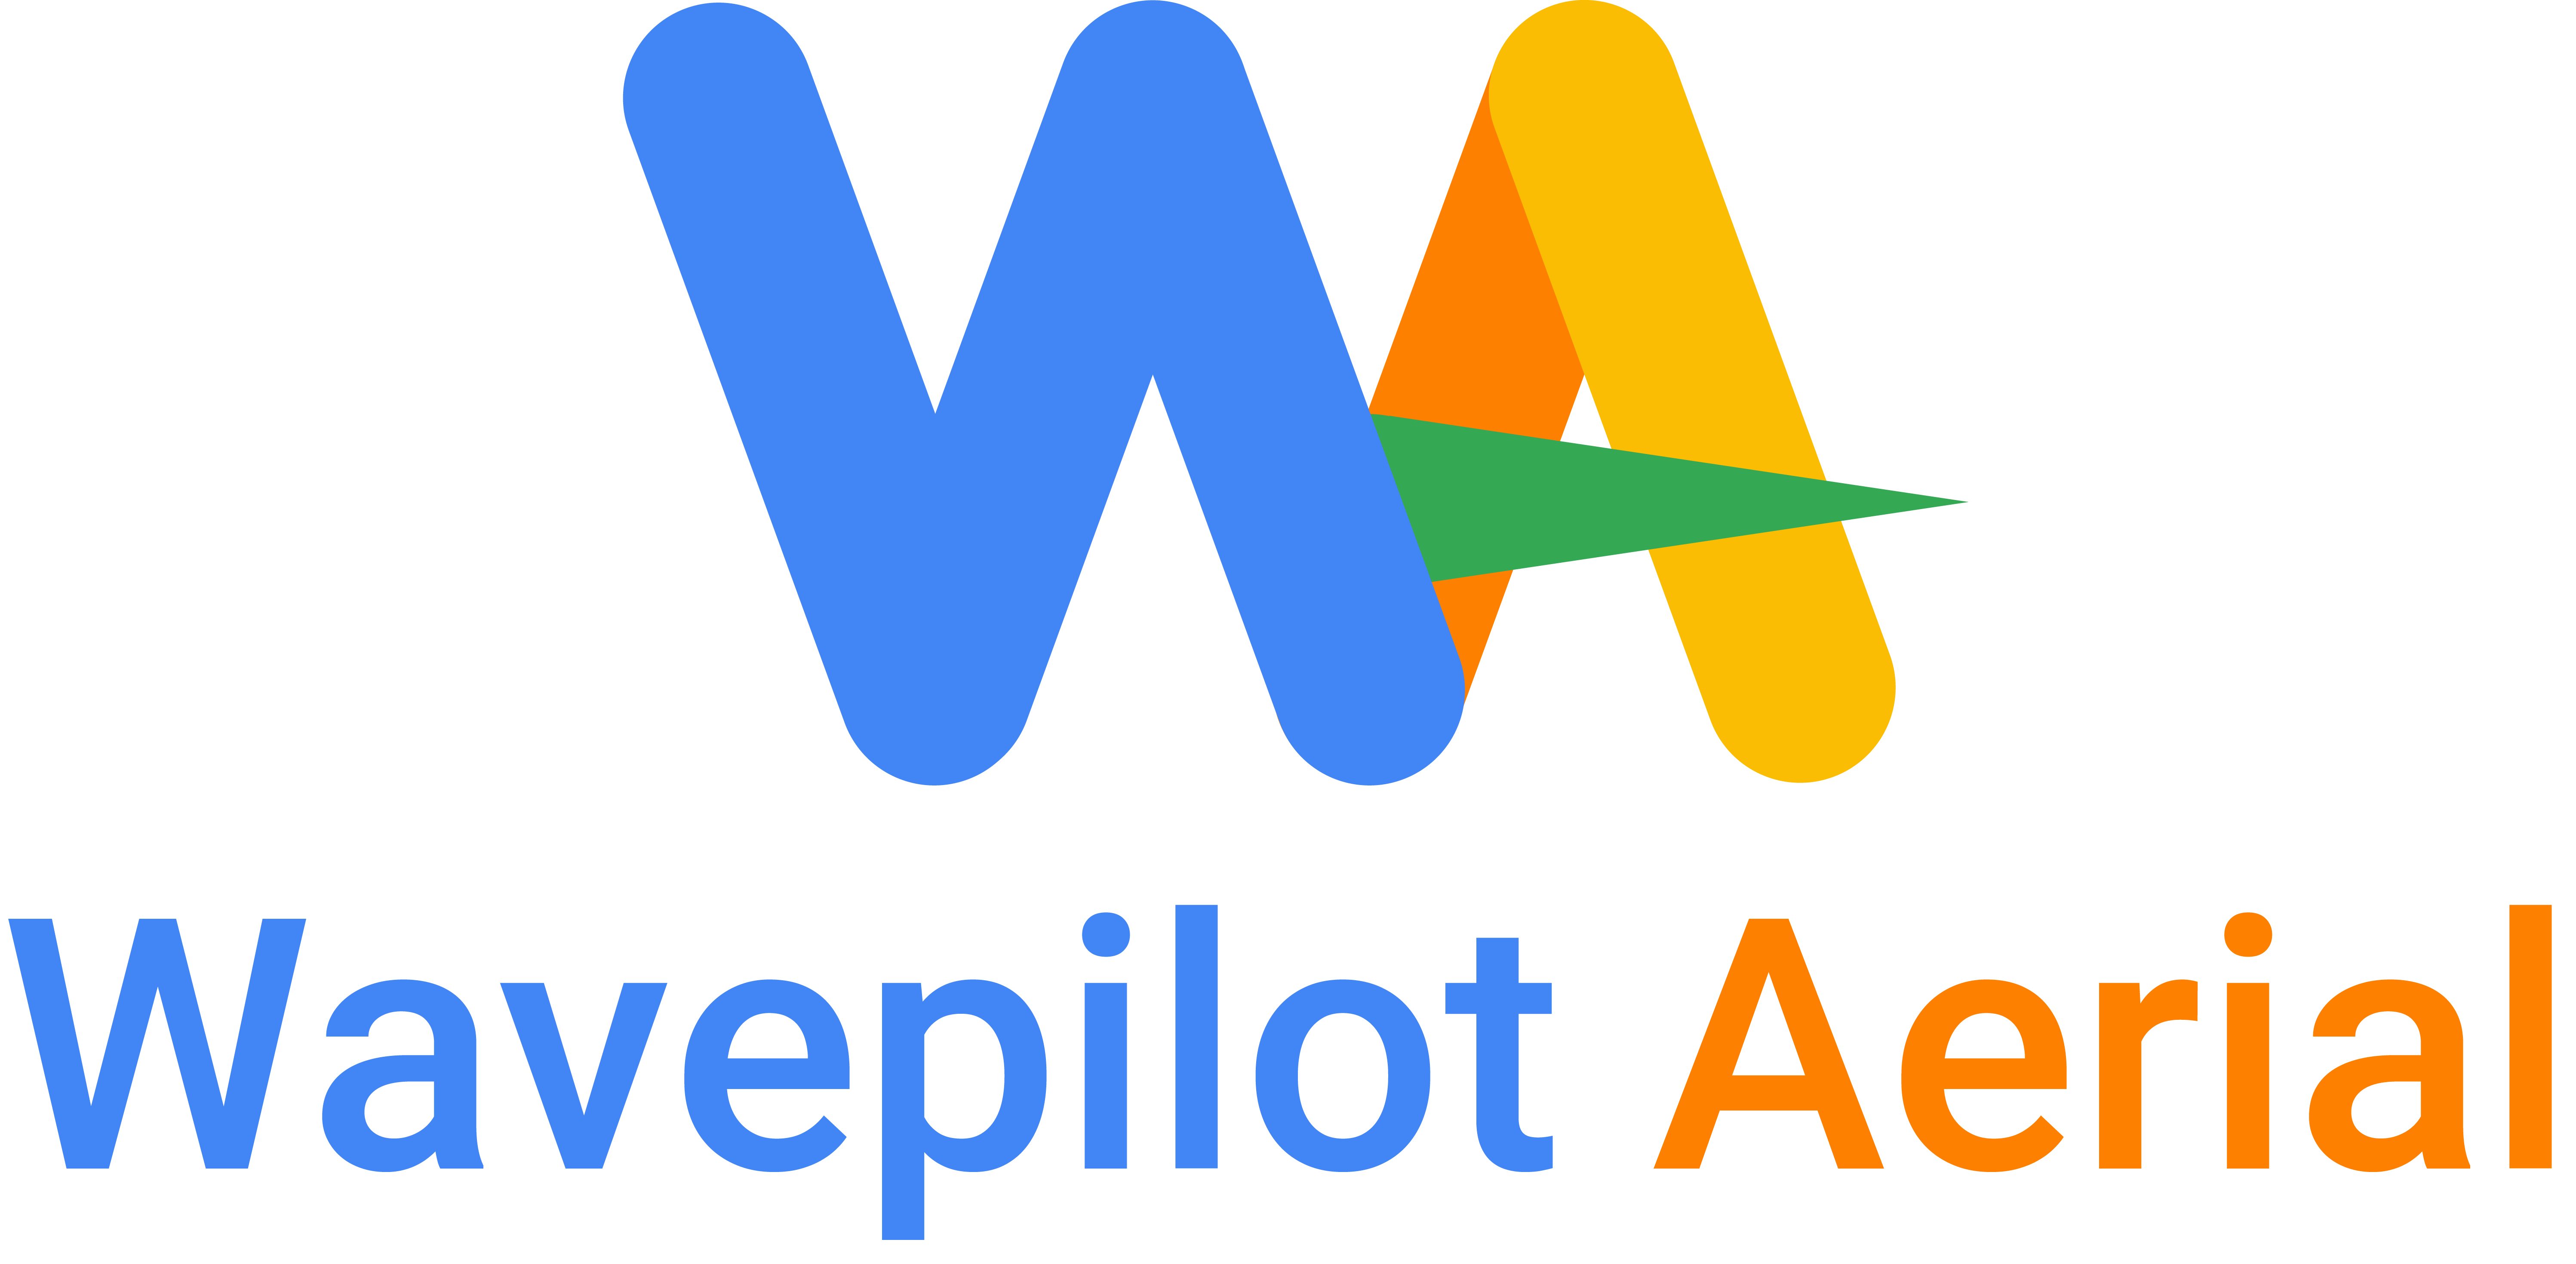 Wavepilot Logo Copy Below